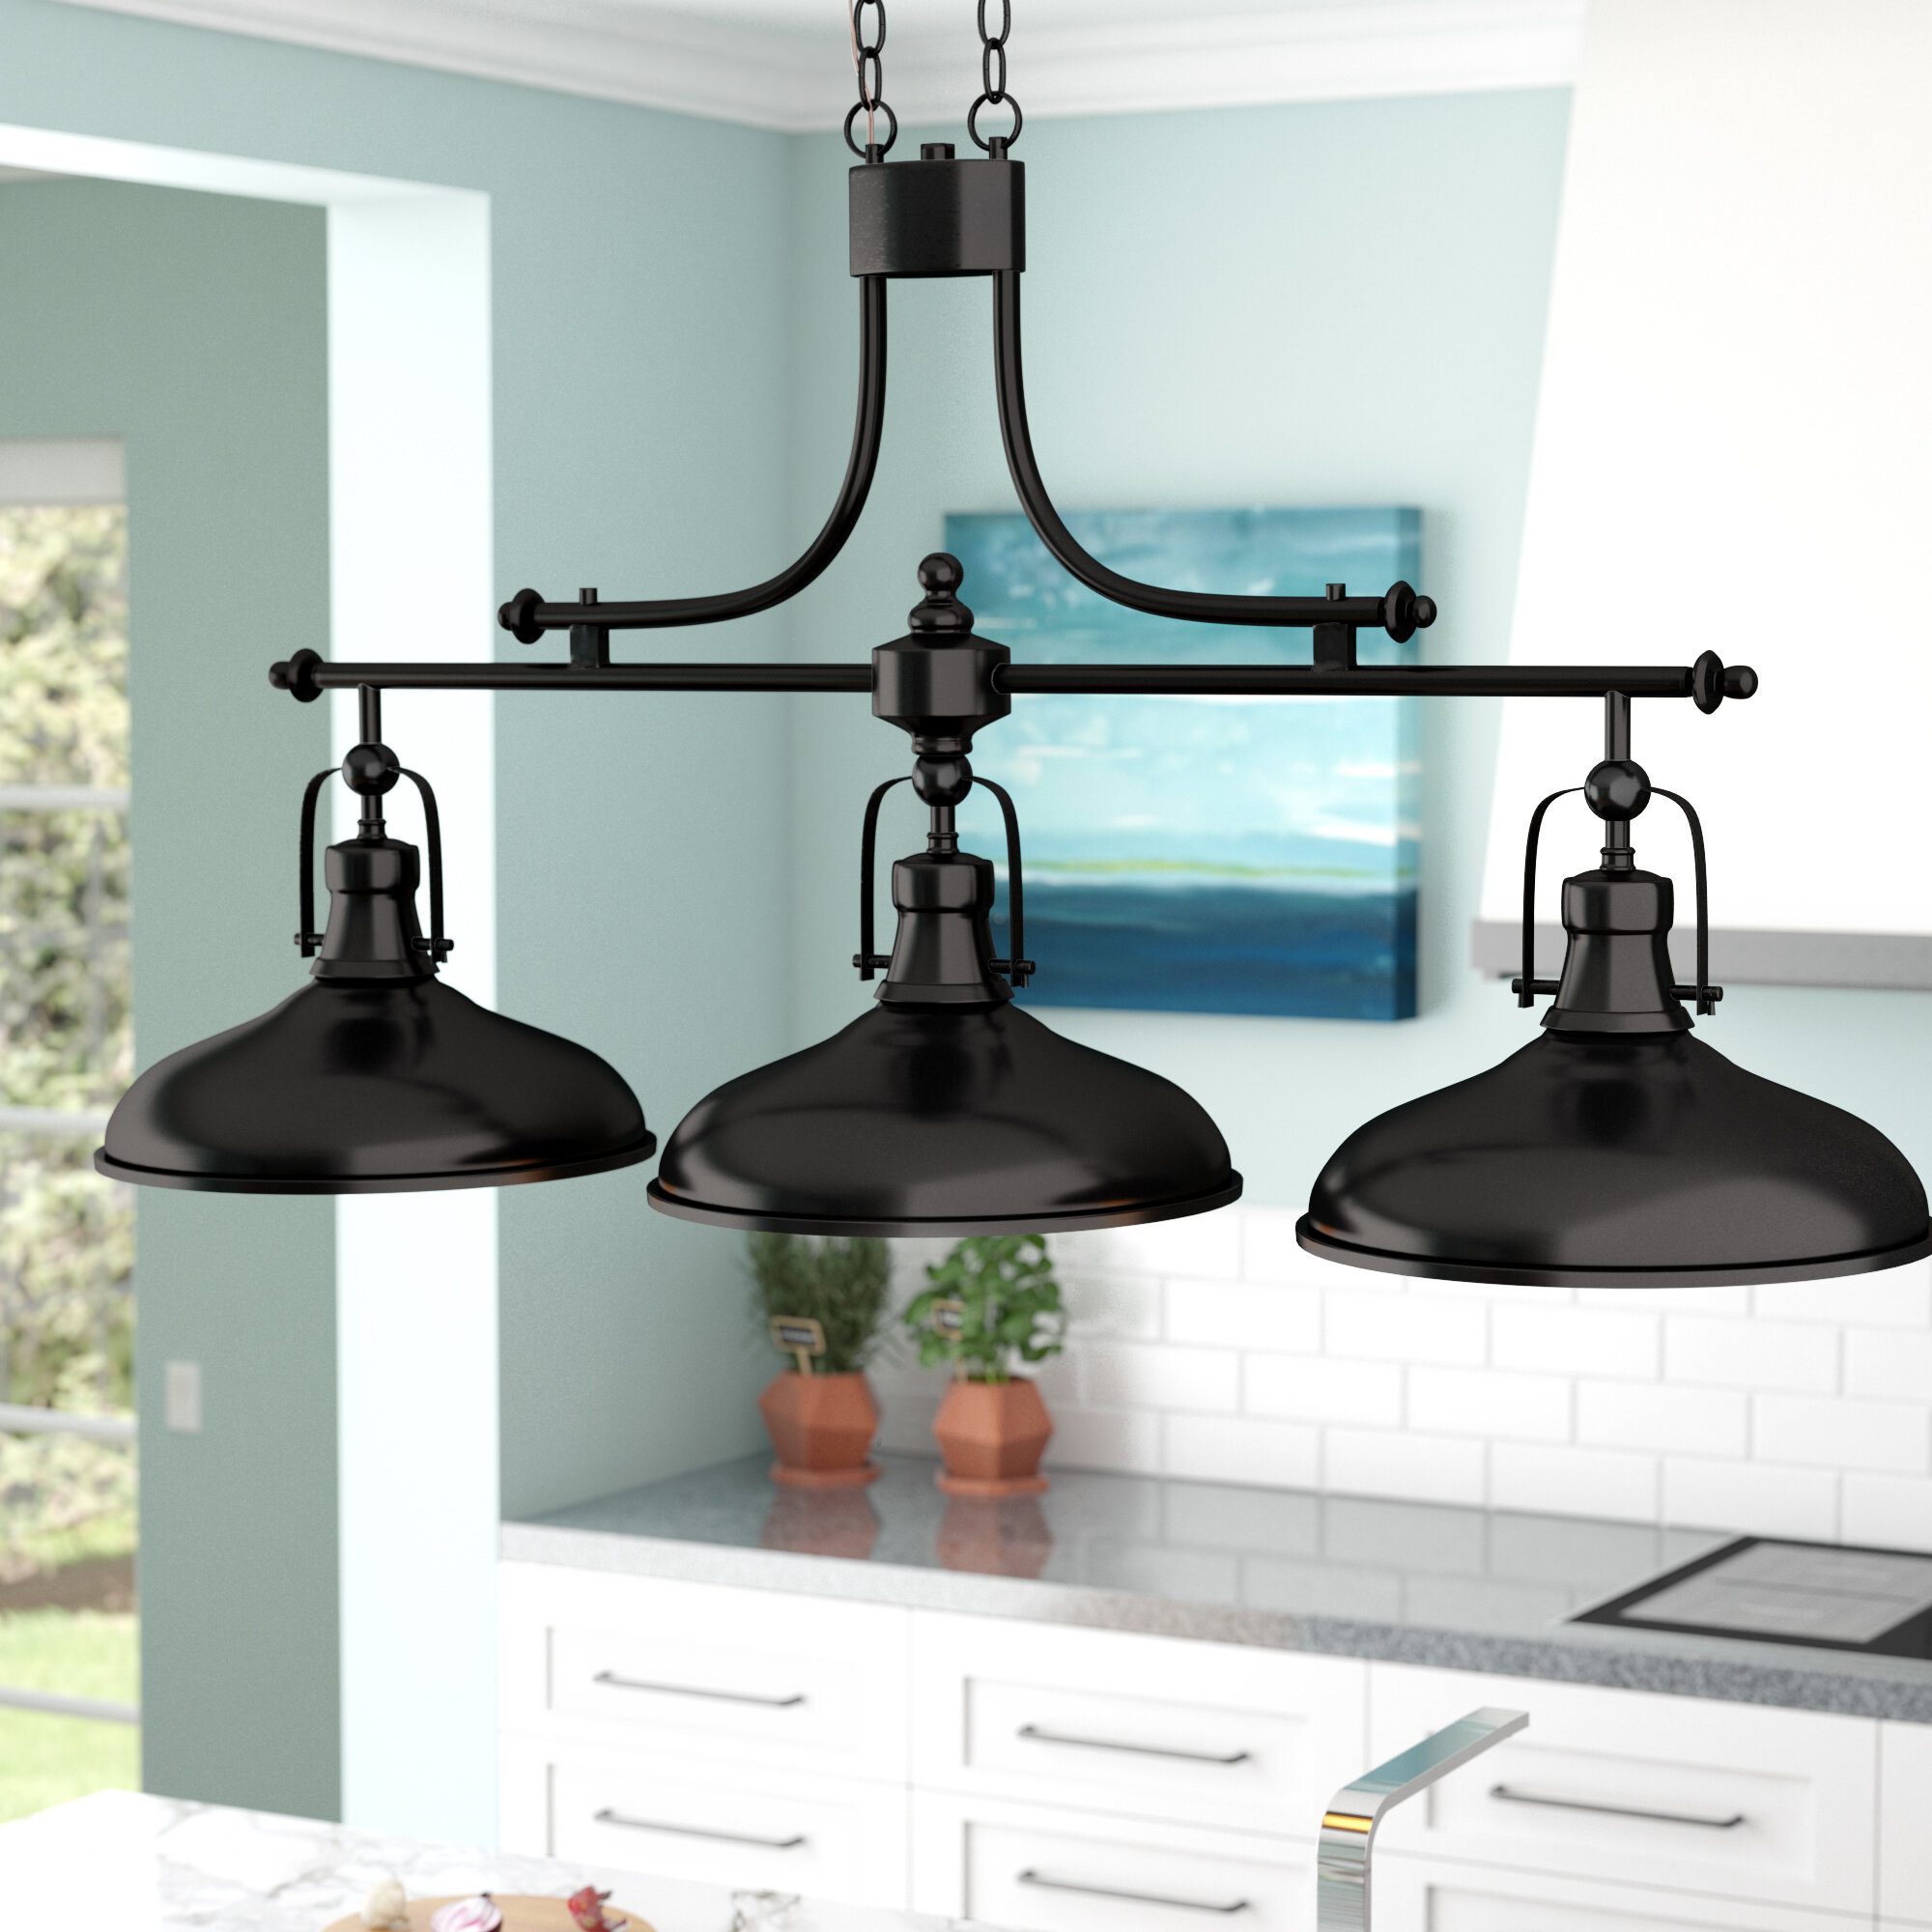 Beachcrest Home Martinique 3-Light Kitchen Island Pendant & Reviews ...